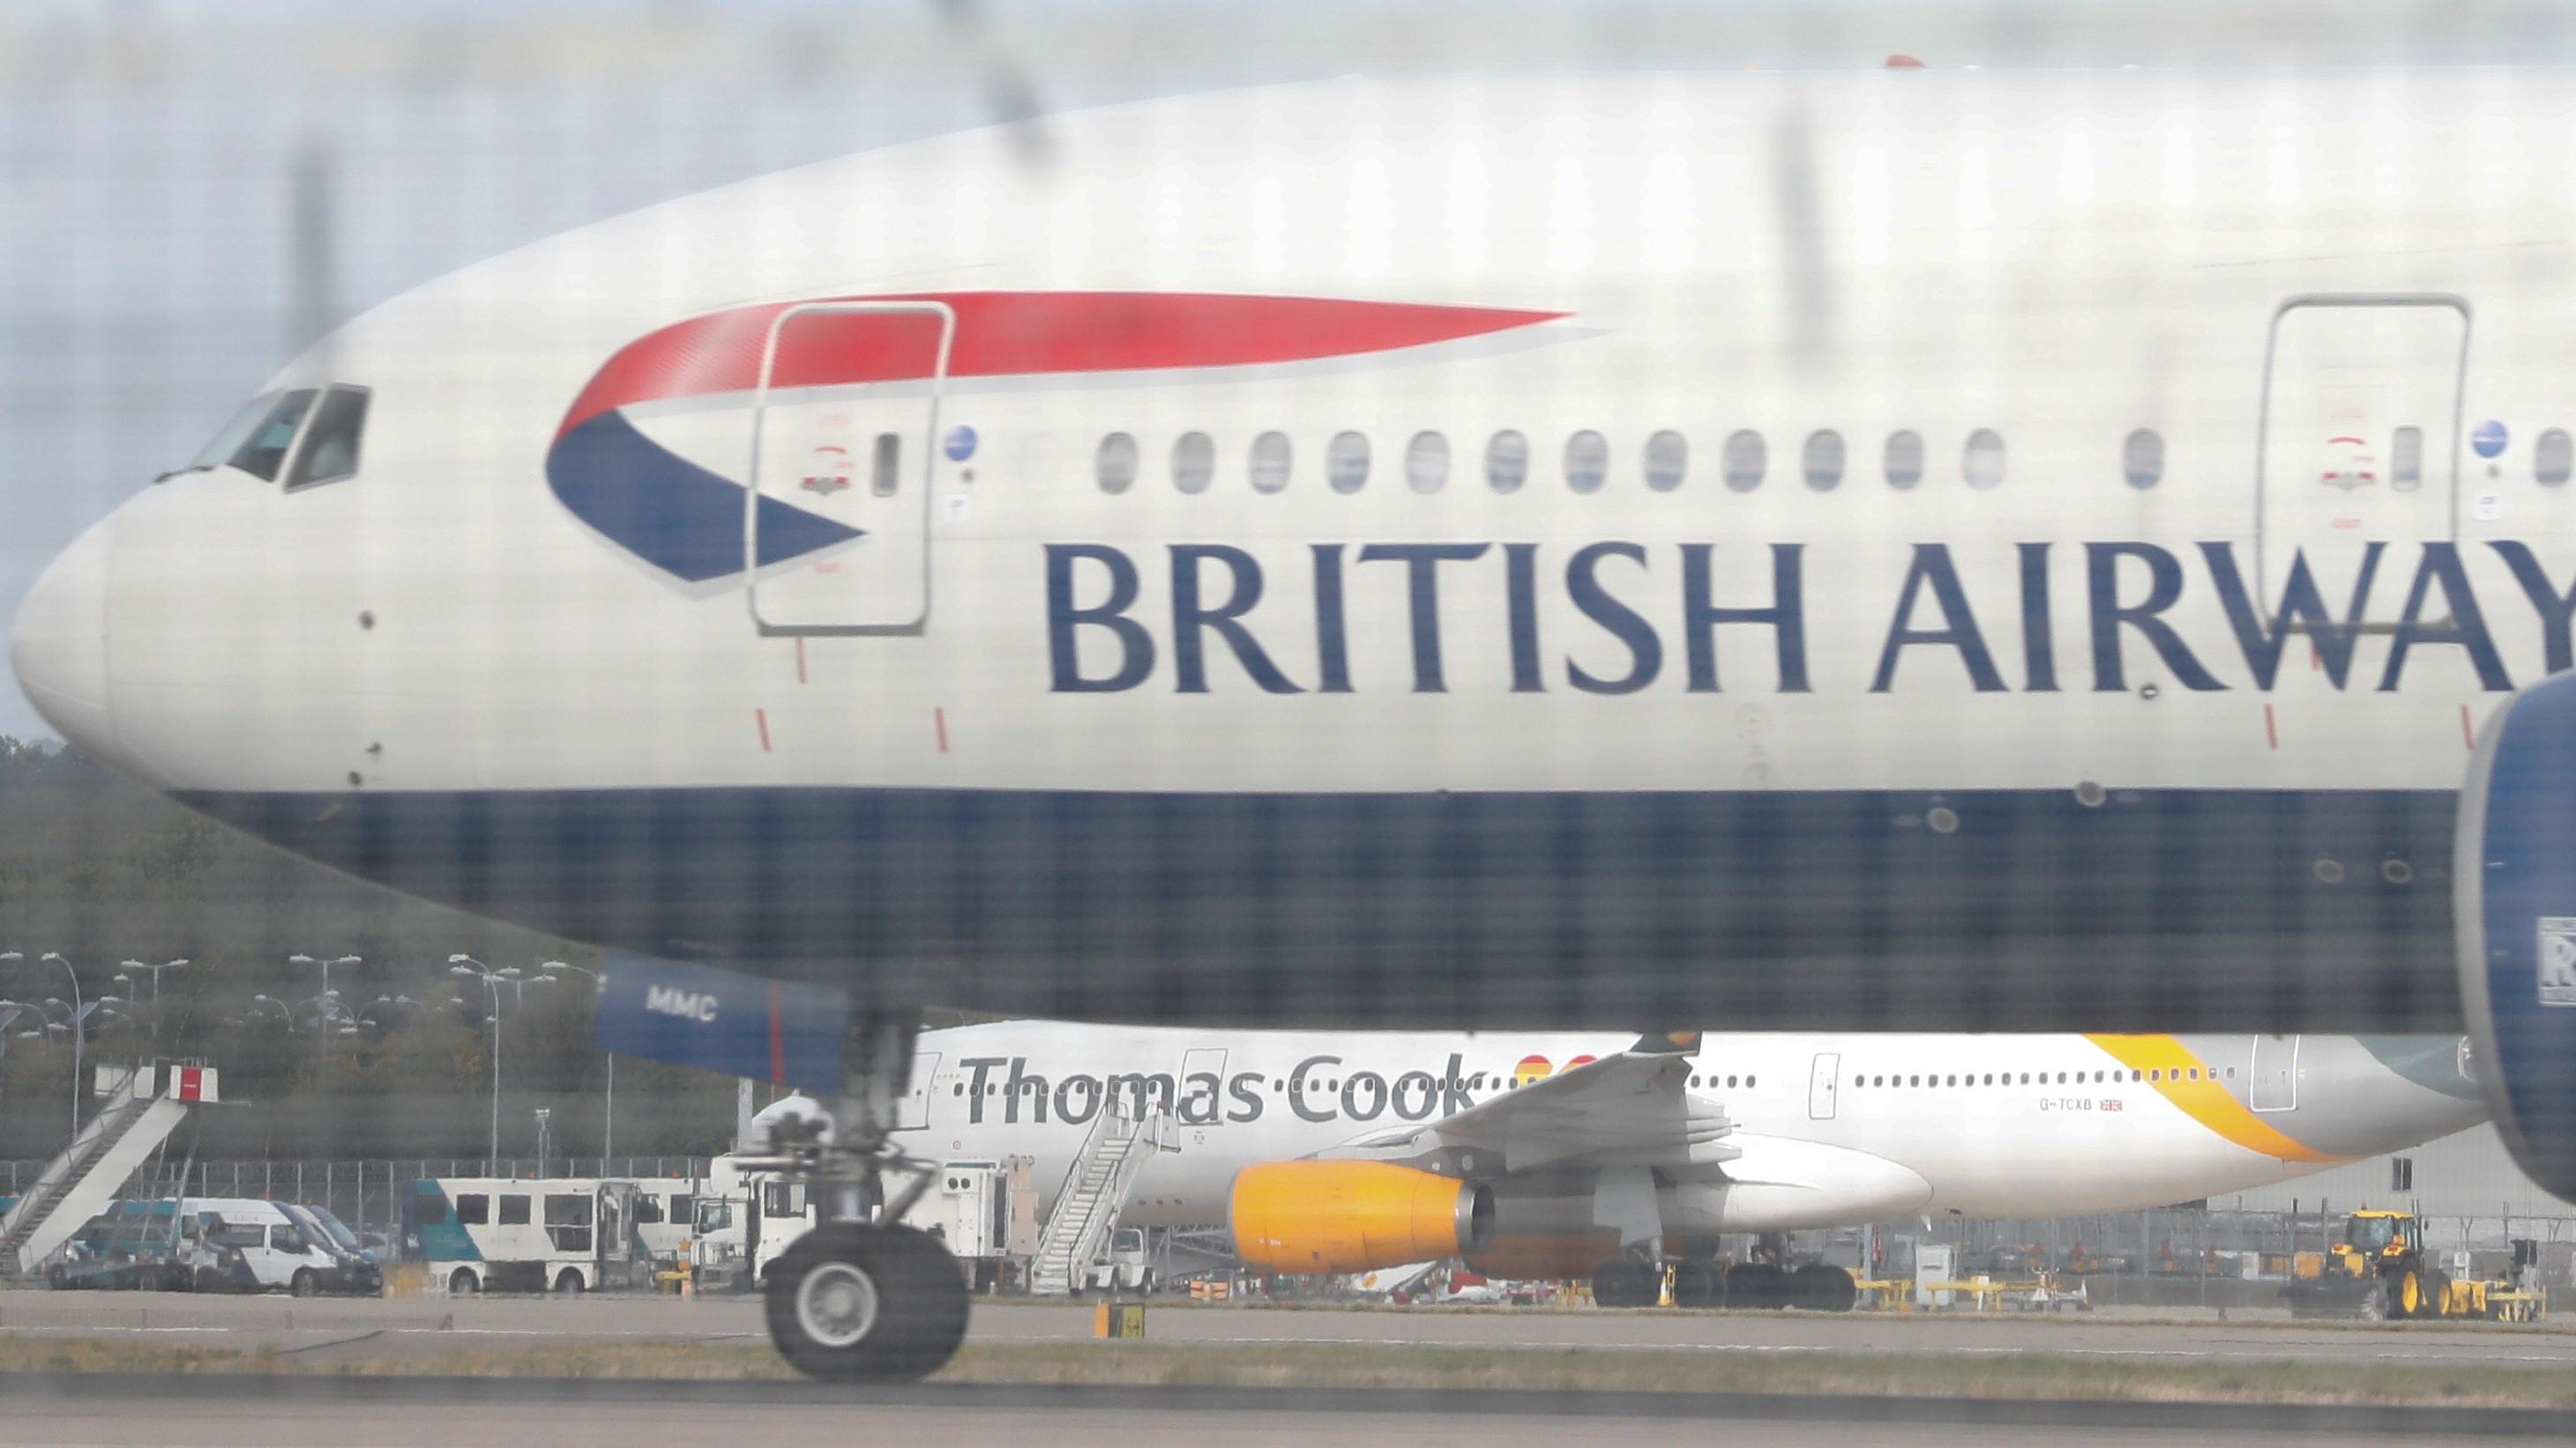 COVID-19: Airlines cancel more flights as EU raises risk rating